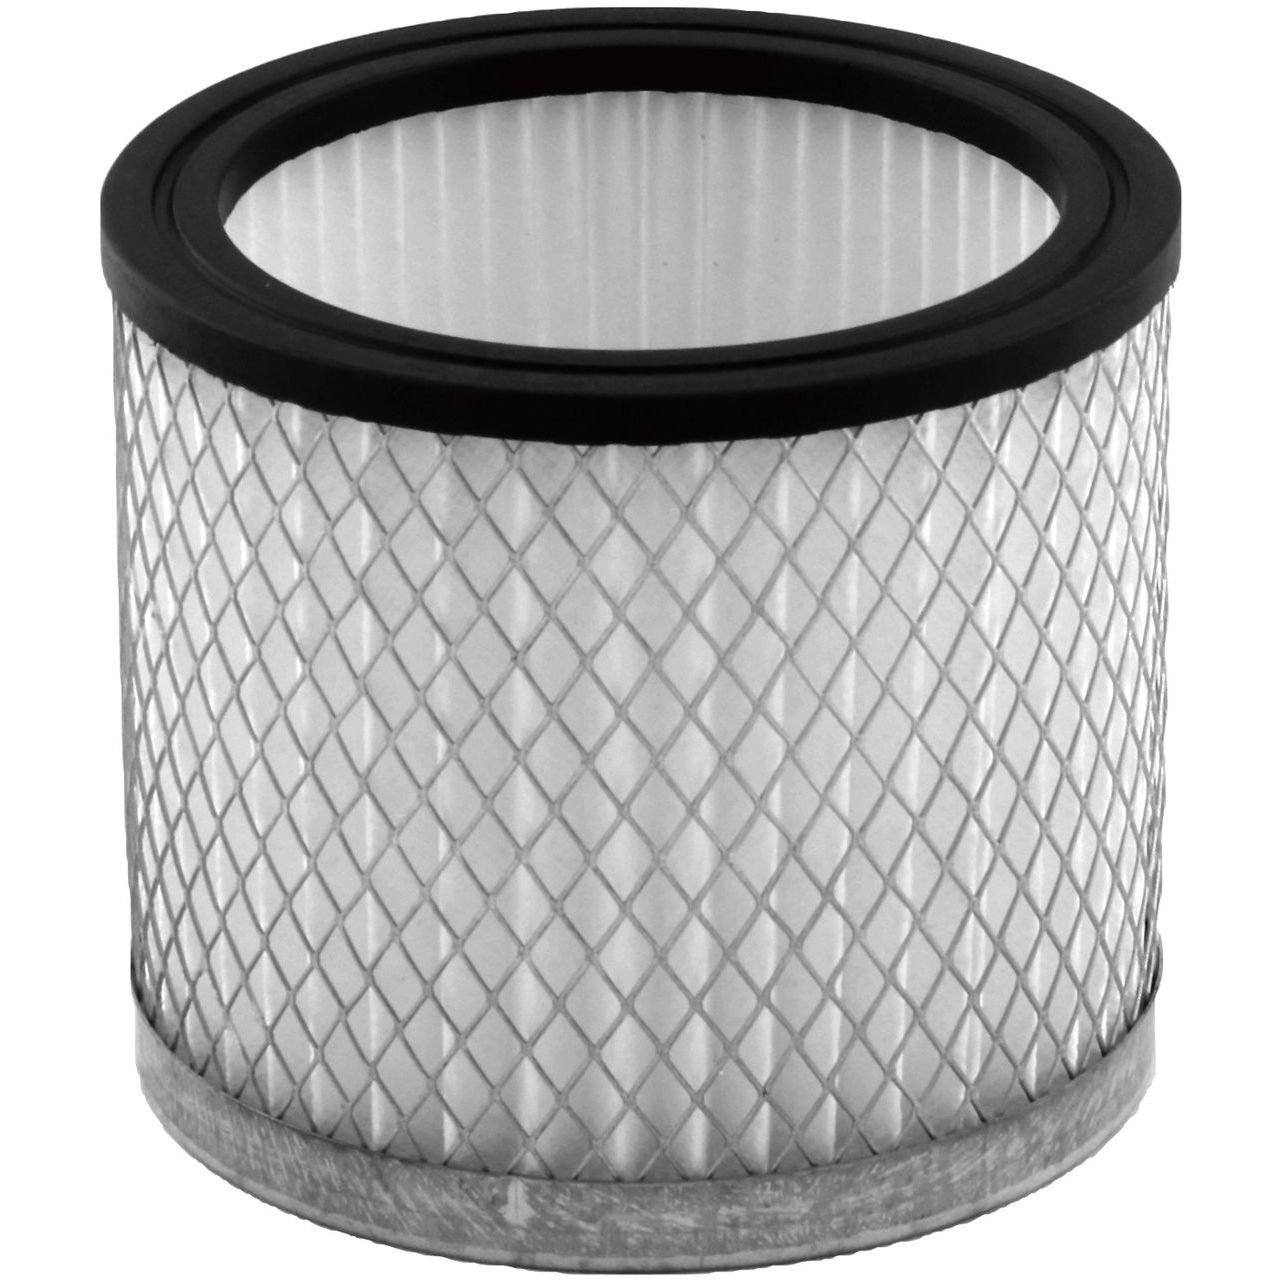 WPPO Replacement HEPA Filter For Ash Vacuum